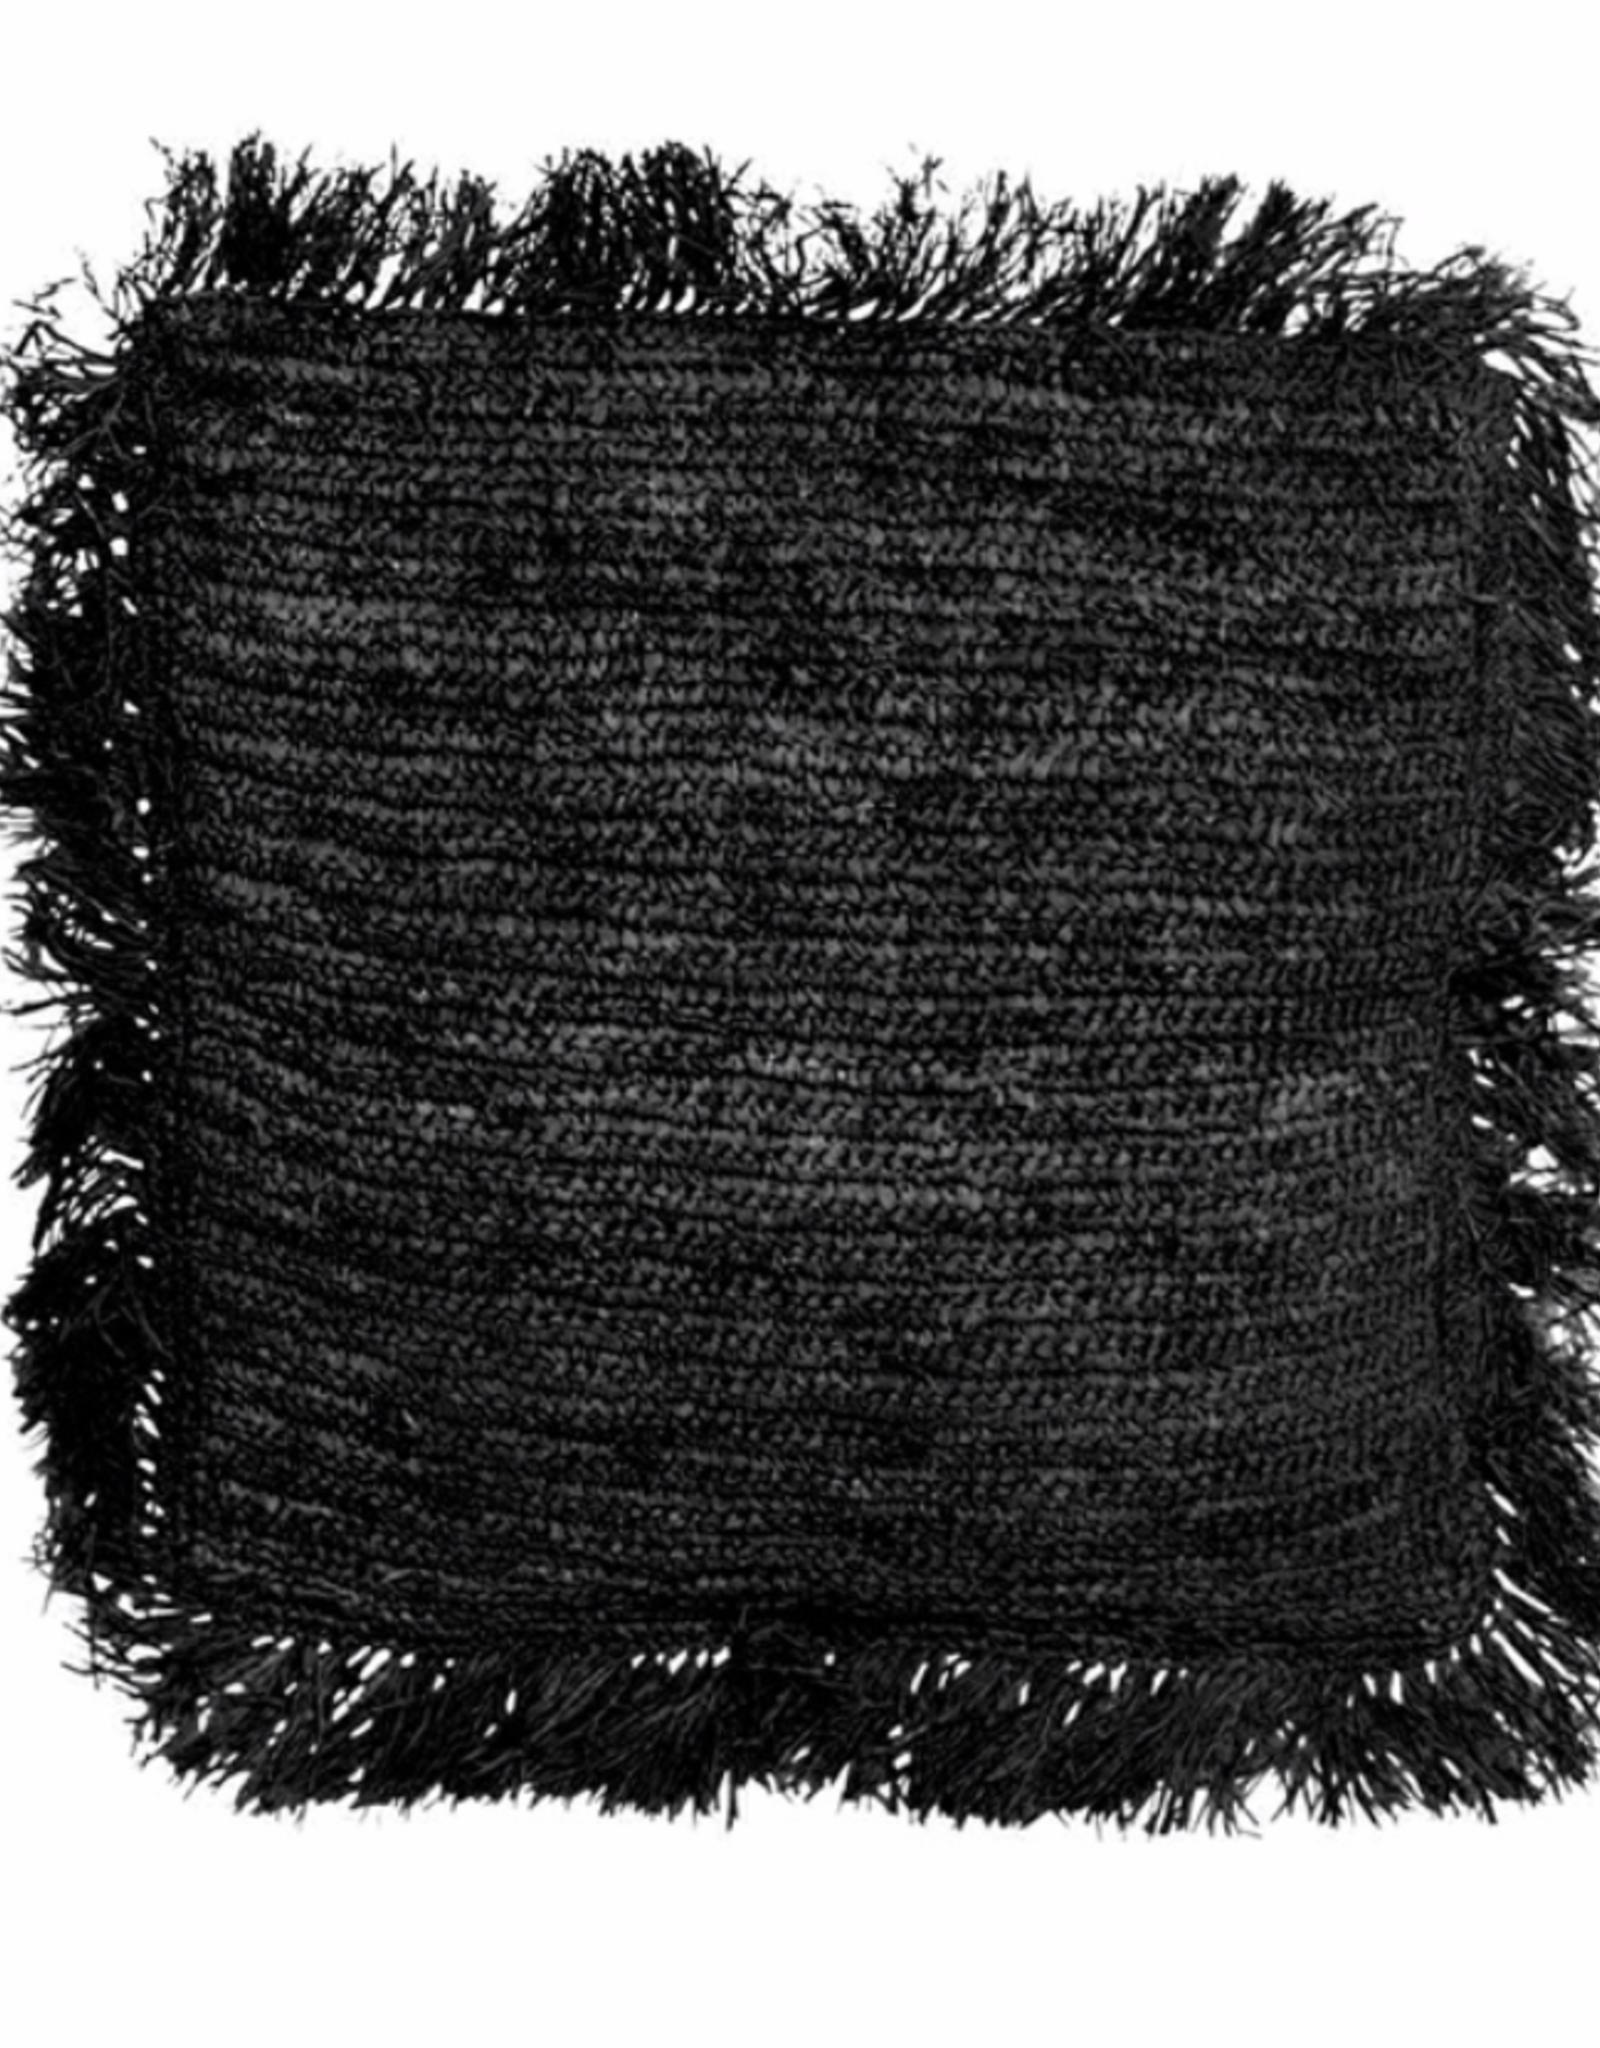 Bazar Bizar Raffia Kussen Zwart Vierkant L